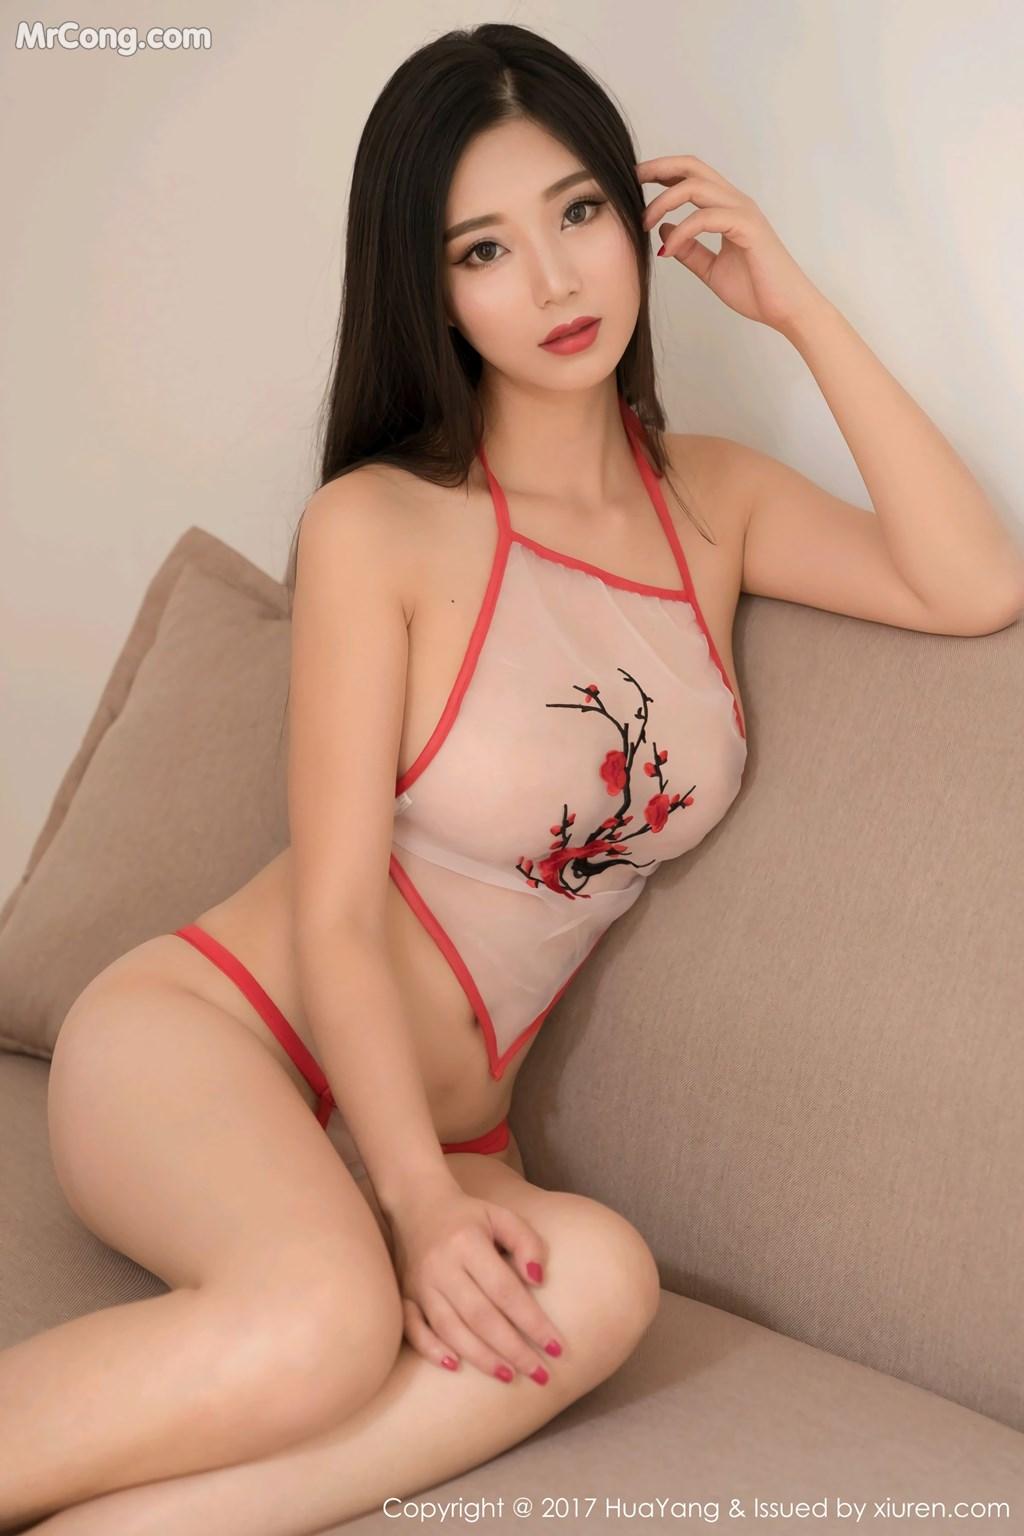 Image HuaYang-2017-11-10-Vol.015-KiKi-MrCong.com-006 in post HuaYang 2017-11-10 Vol.015: Người mẫu 宋-KiKi (45 ảnh)